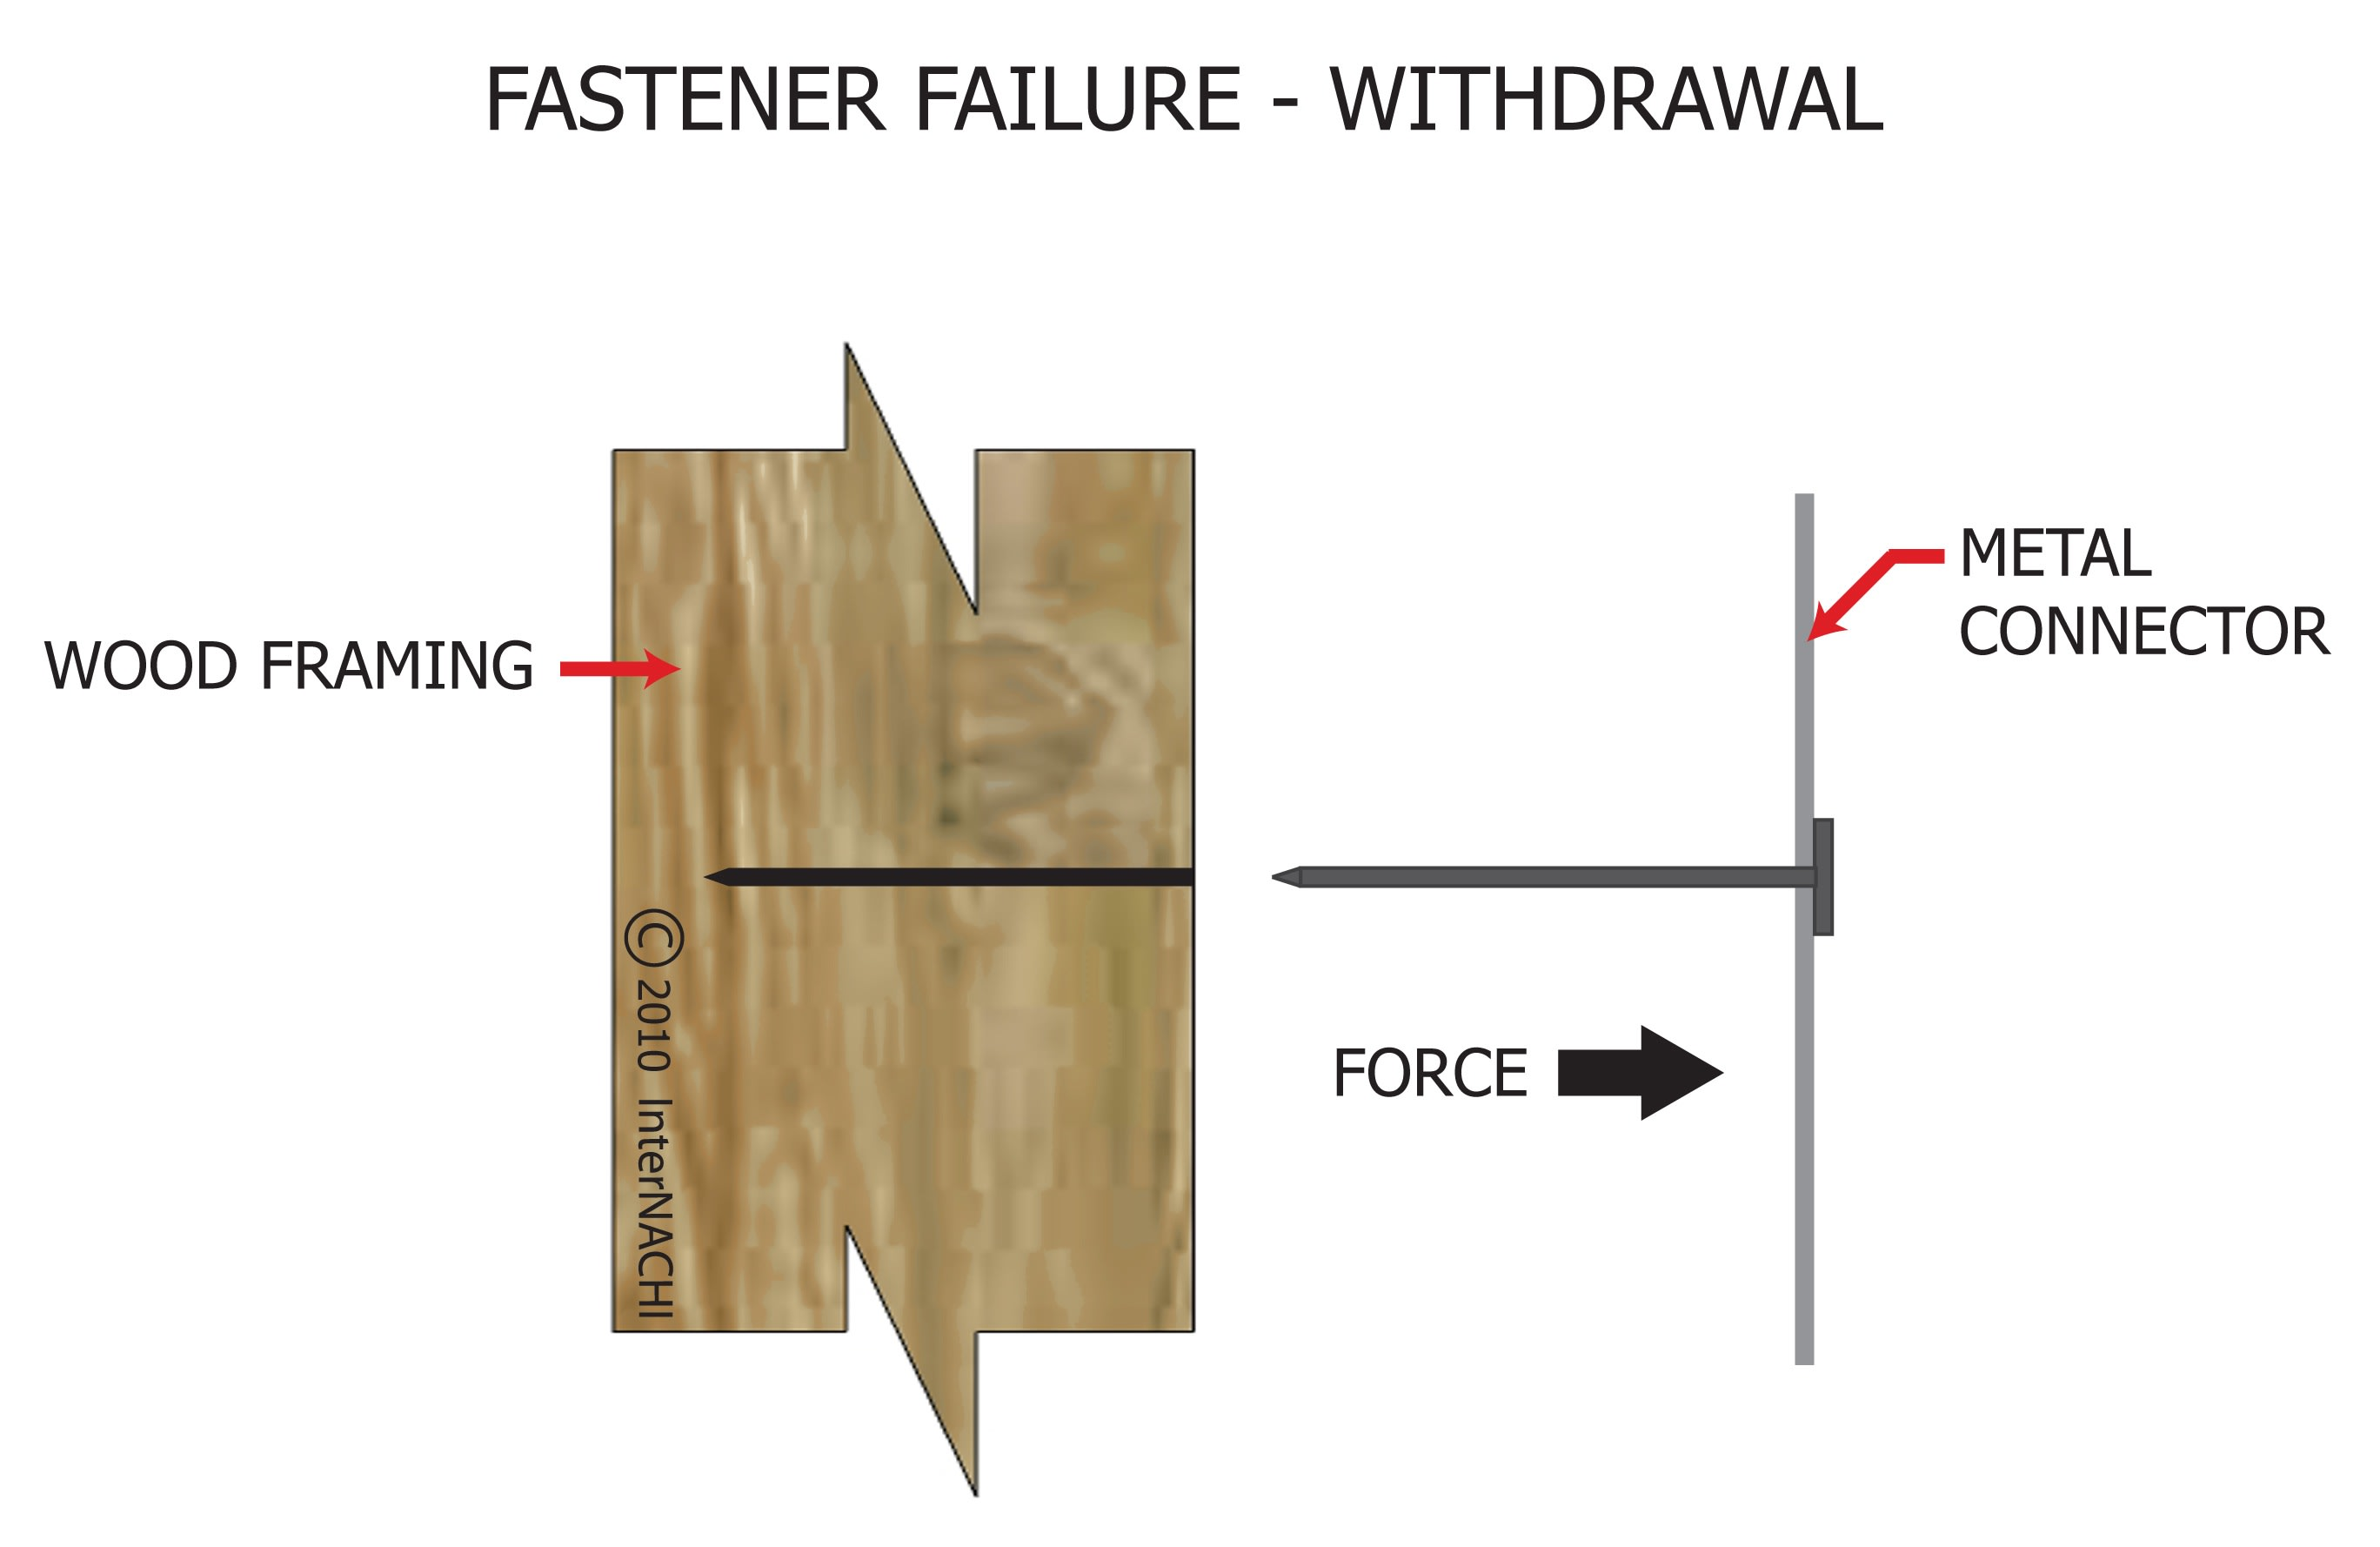 Fastener failure - withdrawal.